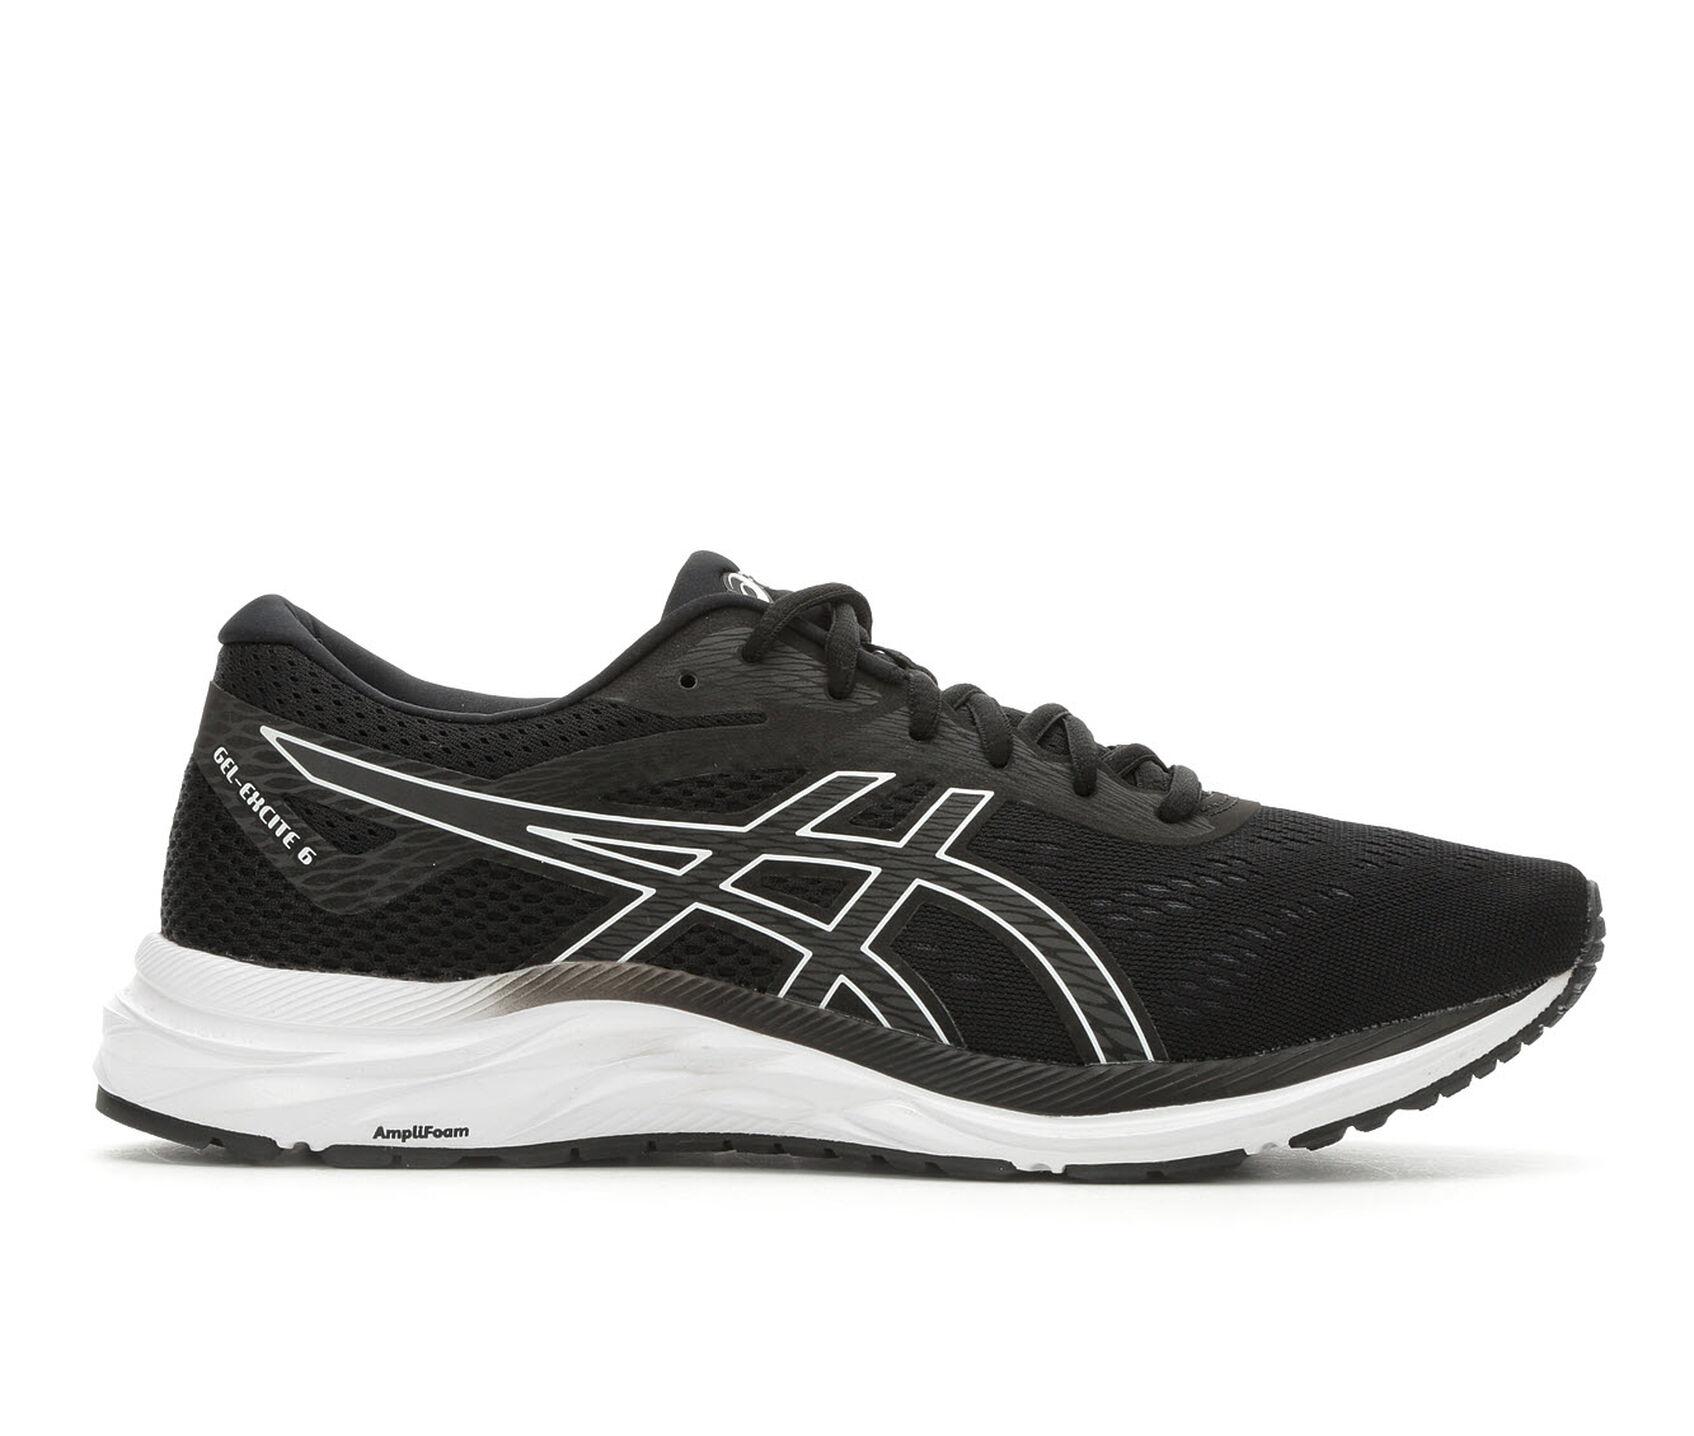 sale retailer 73fe0 8dbcc Men's ASICS Gel Excite 6 Running Shoes